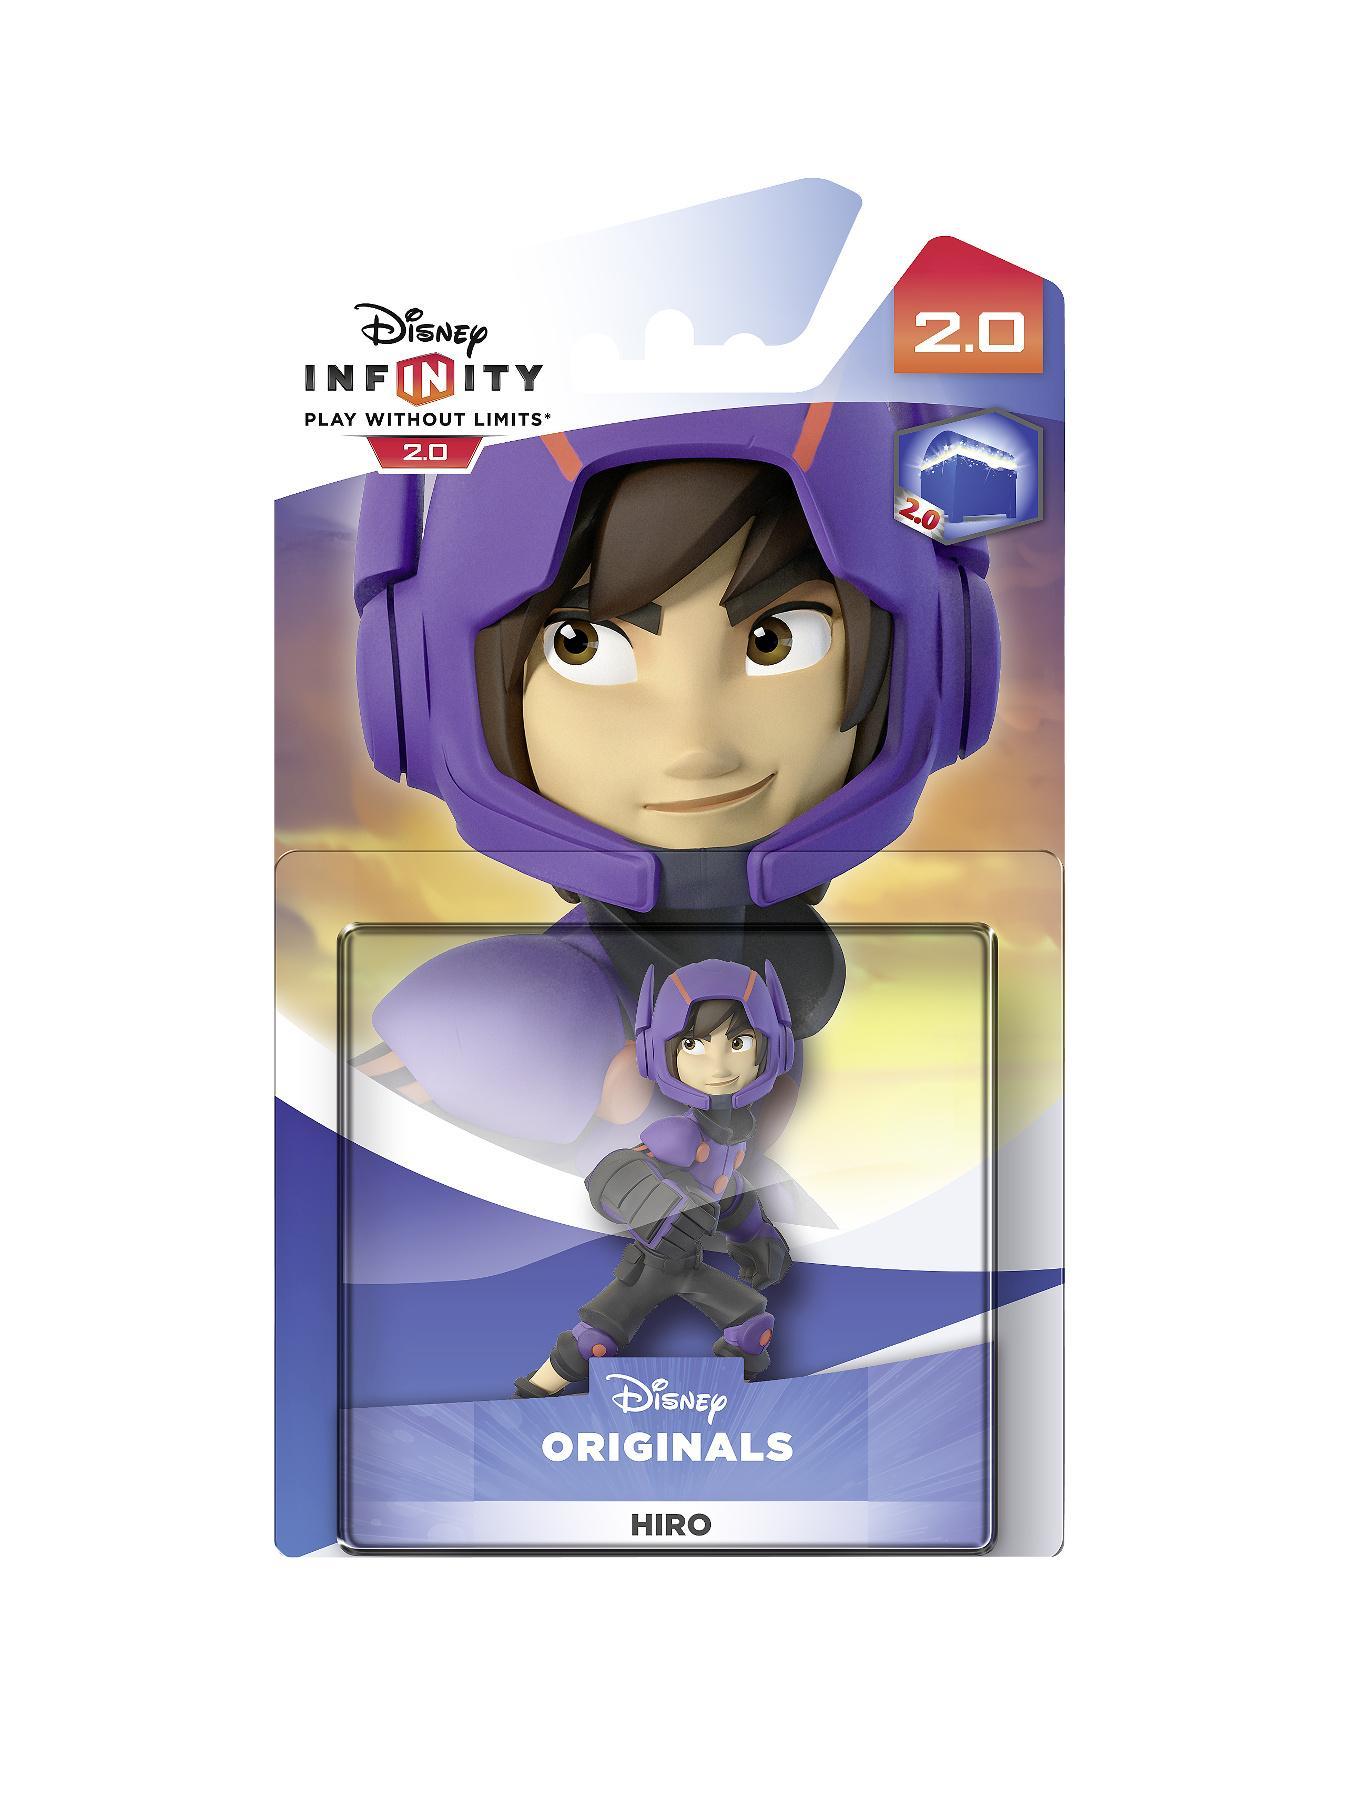 Disney Infinity 2.0 - Hiro Figure